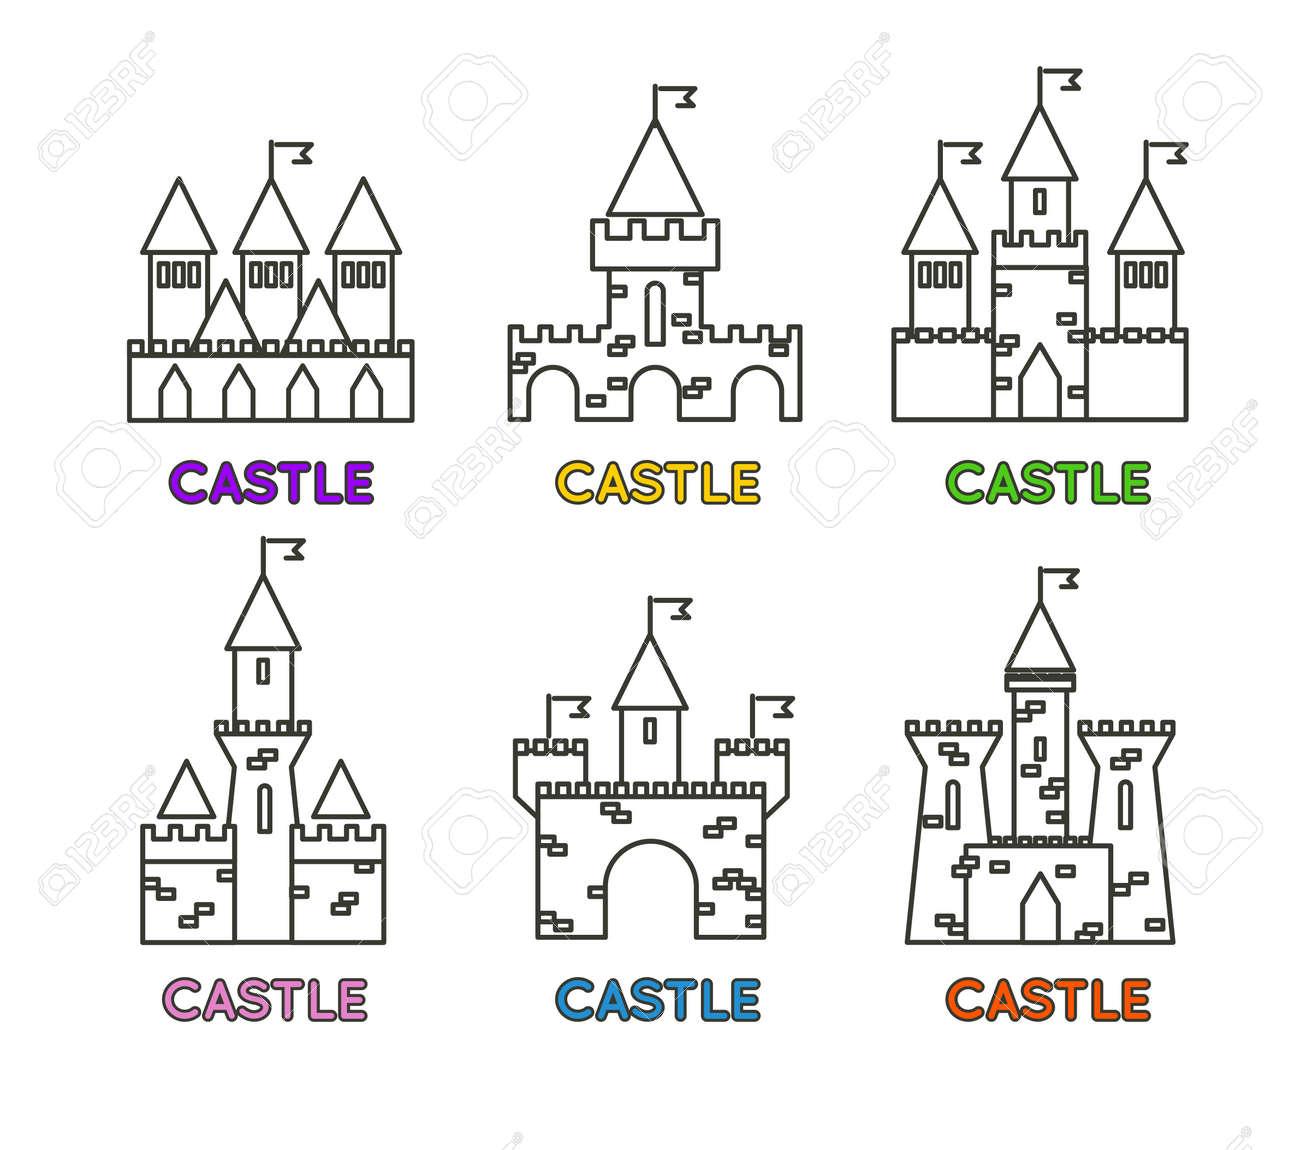 57822143 castle vector set castle tower vector logo castle turret with flag history castle architecture illus castle vector set castle tower vector logo castle turret with